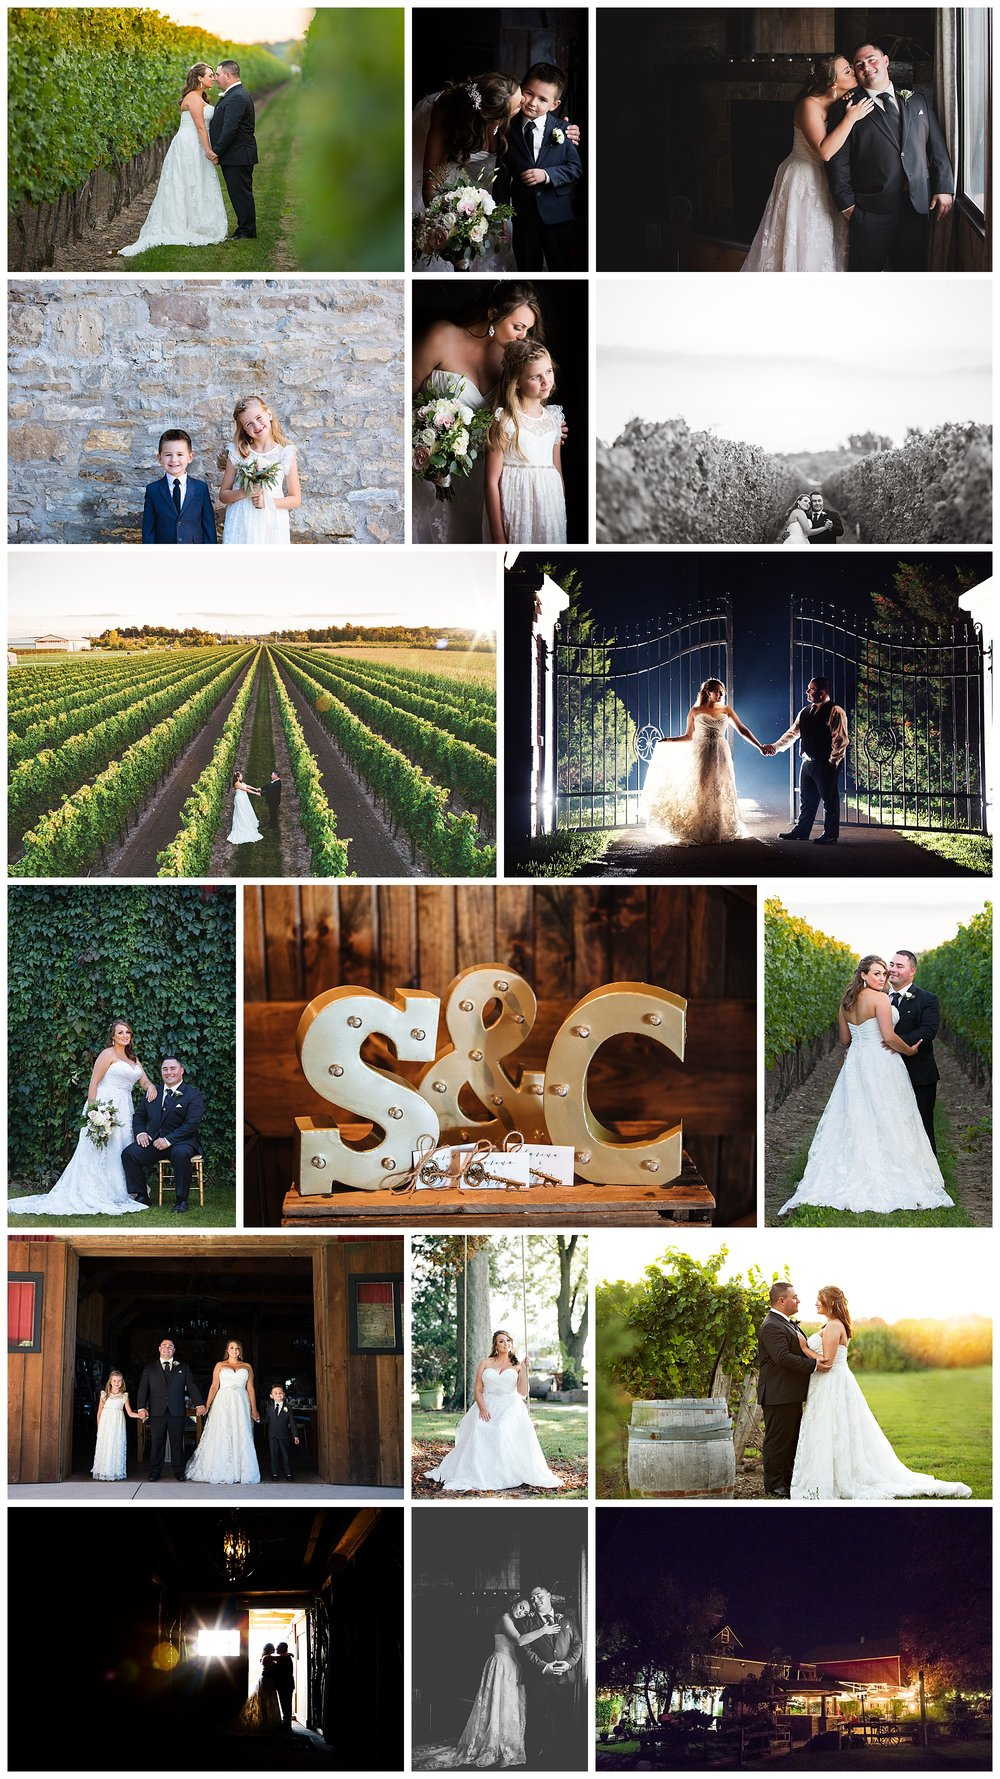 Honsberger Estates, Niagara, Ontario wedding photography by VanDaele & Russell